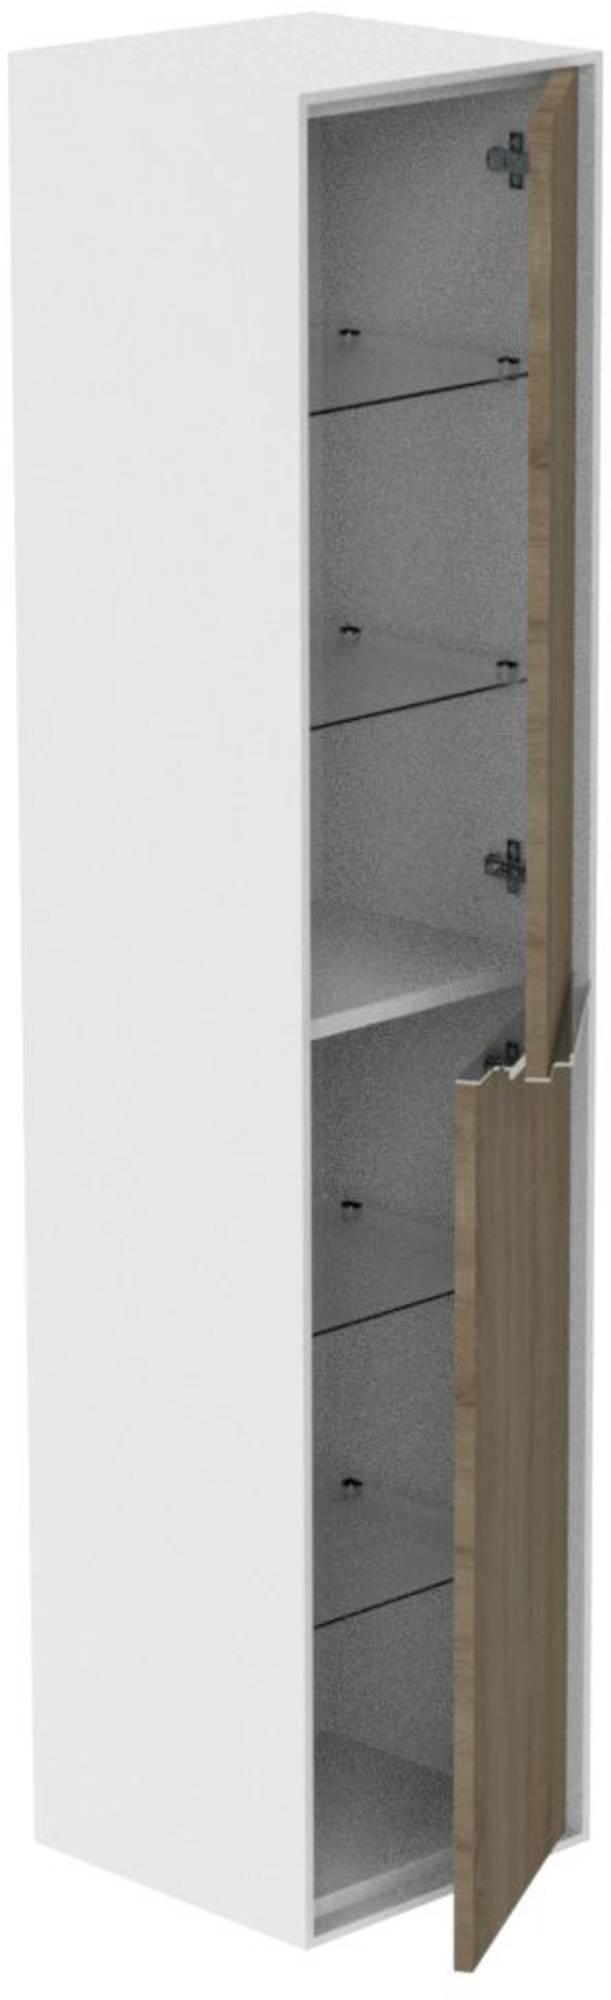 Thebalux Sense Hoge Kast 37x30,6x167 cm Nebraska Eiken